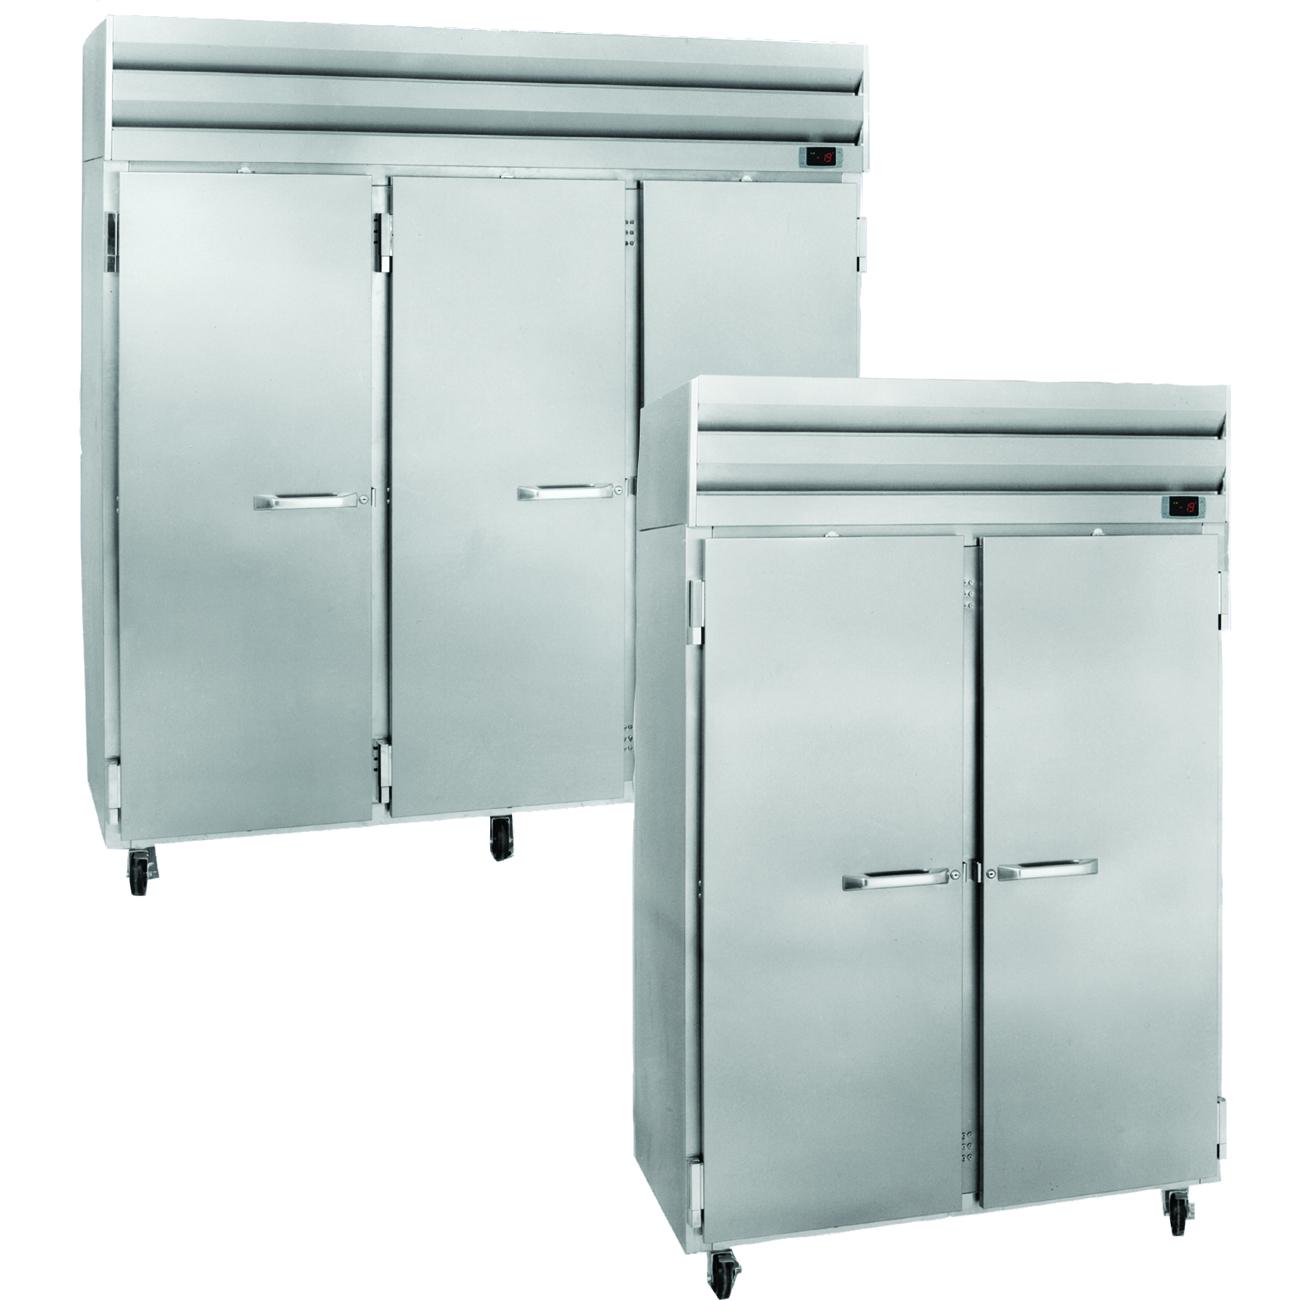 Howard-McCray SR48-S refrigerator, reach-in